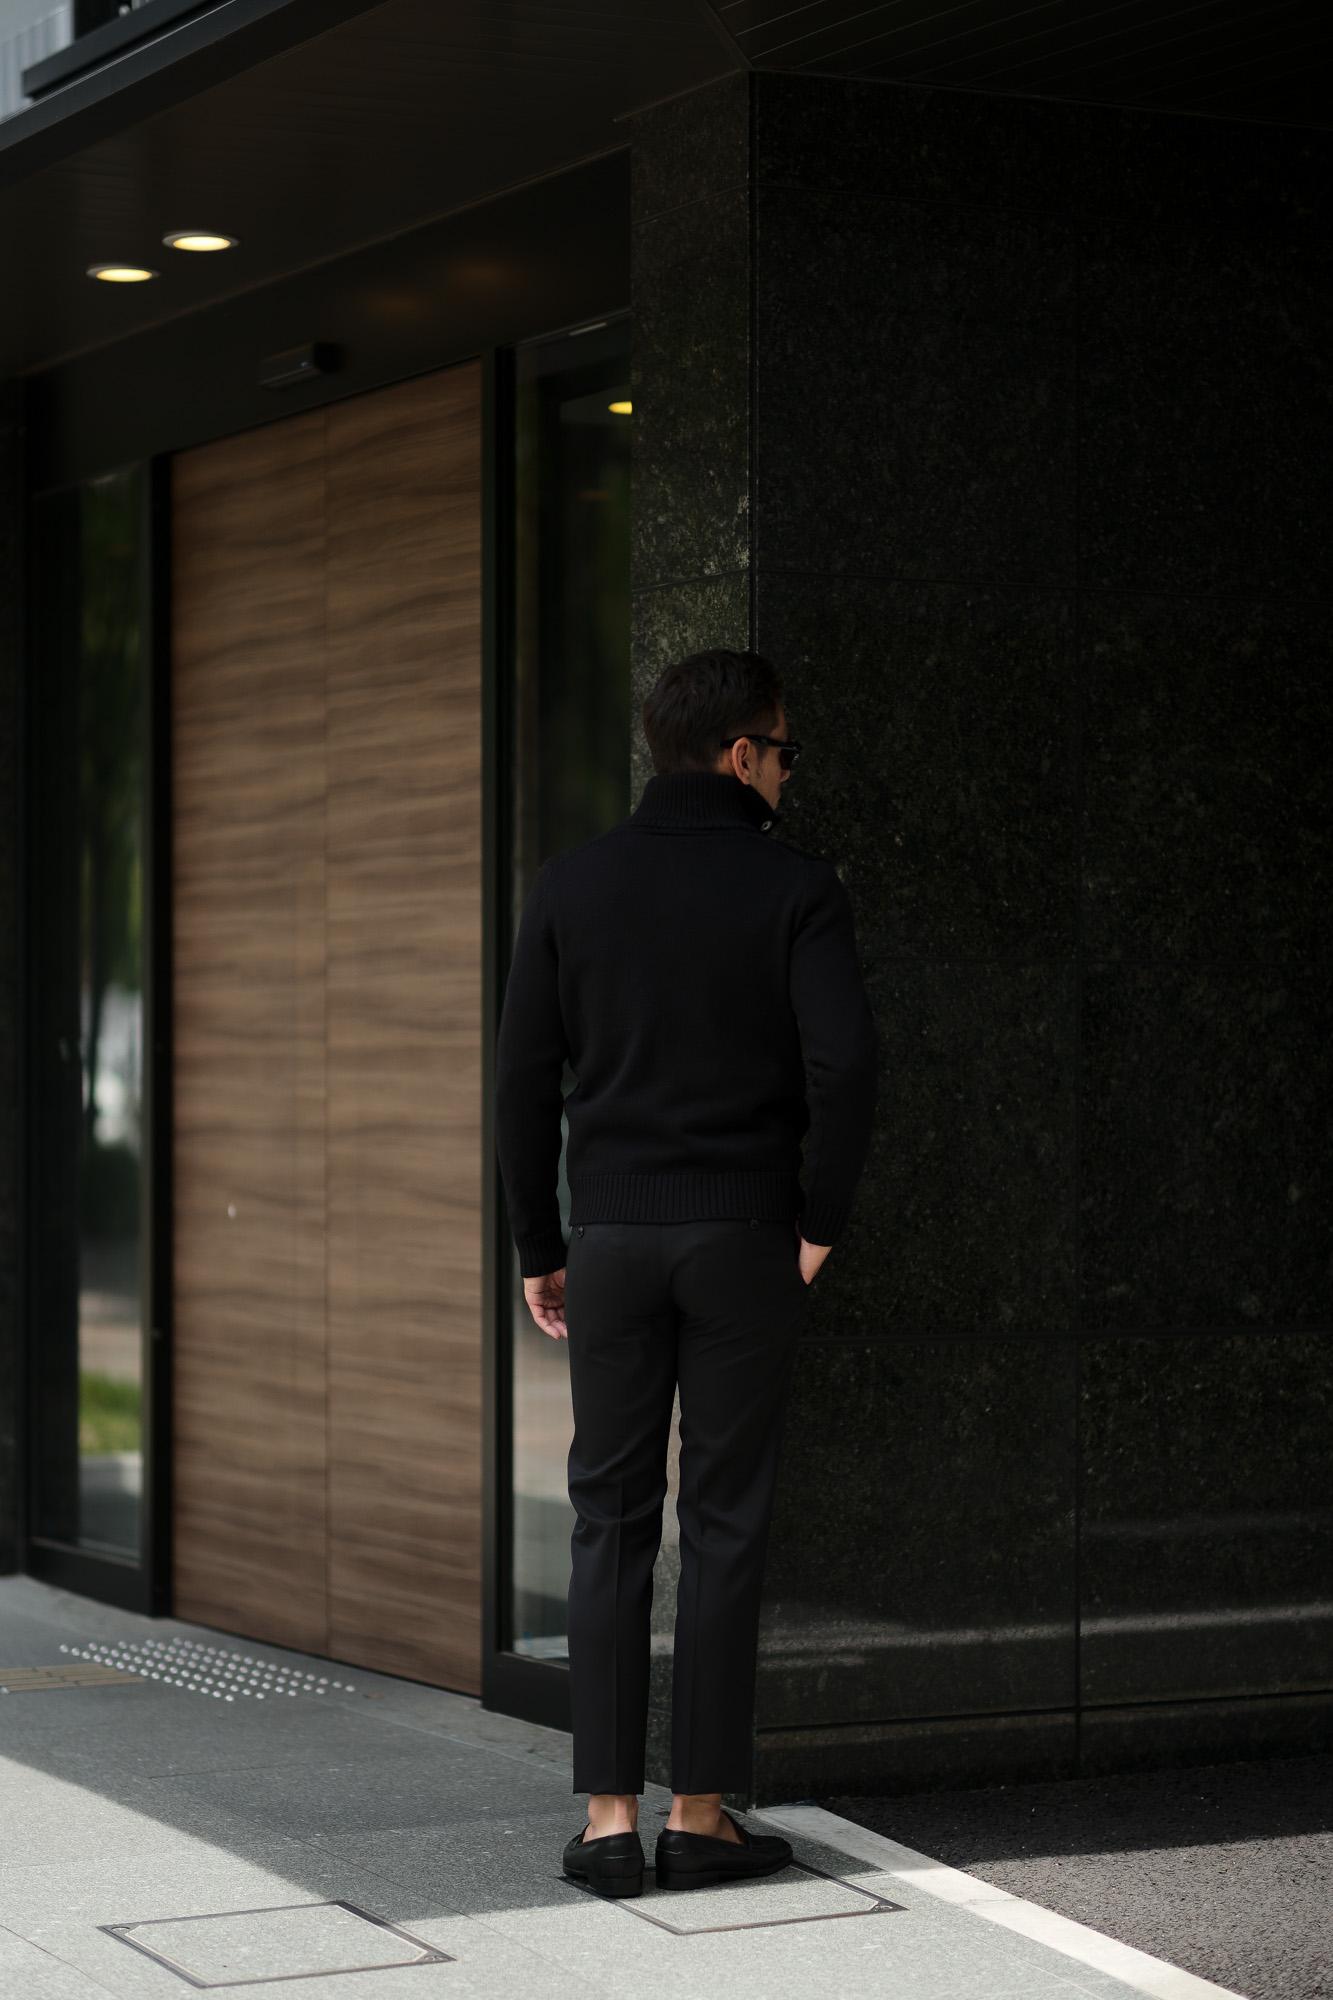 ZANONE (ザノーネ) CHIOTO KYOTO (キョウト キョート) 812218 z0229 (ミドルゲージ ニット ジャケット) BLACK (ブラック・Z0015) MADE IN ITALY(イタリア製) 2019 秋冬 【ご予約受付中】zanone 愛知 名古屋 Alto e Diritto アルト エ デリット alto e diritto アルトエデリット ニット